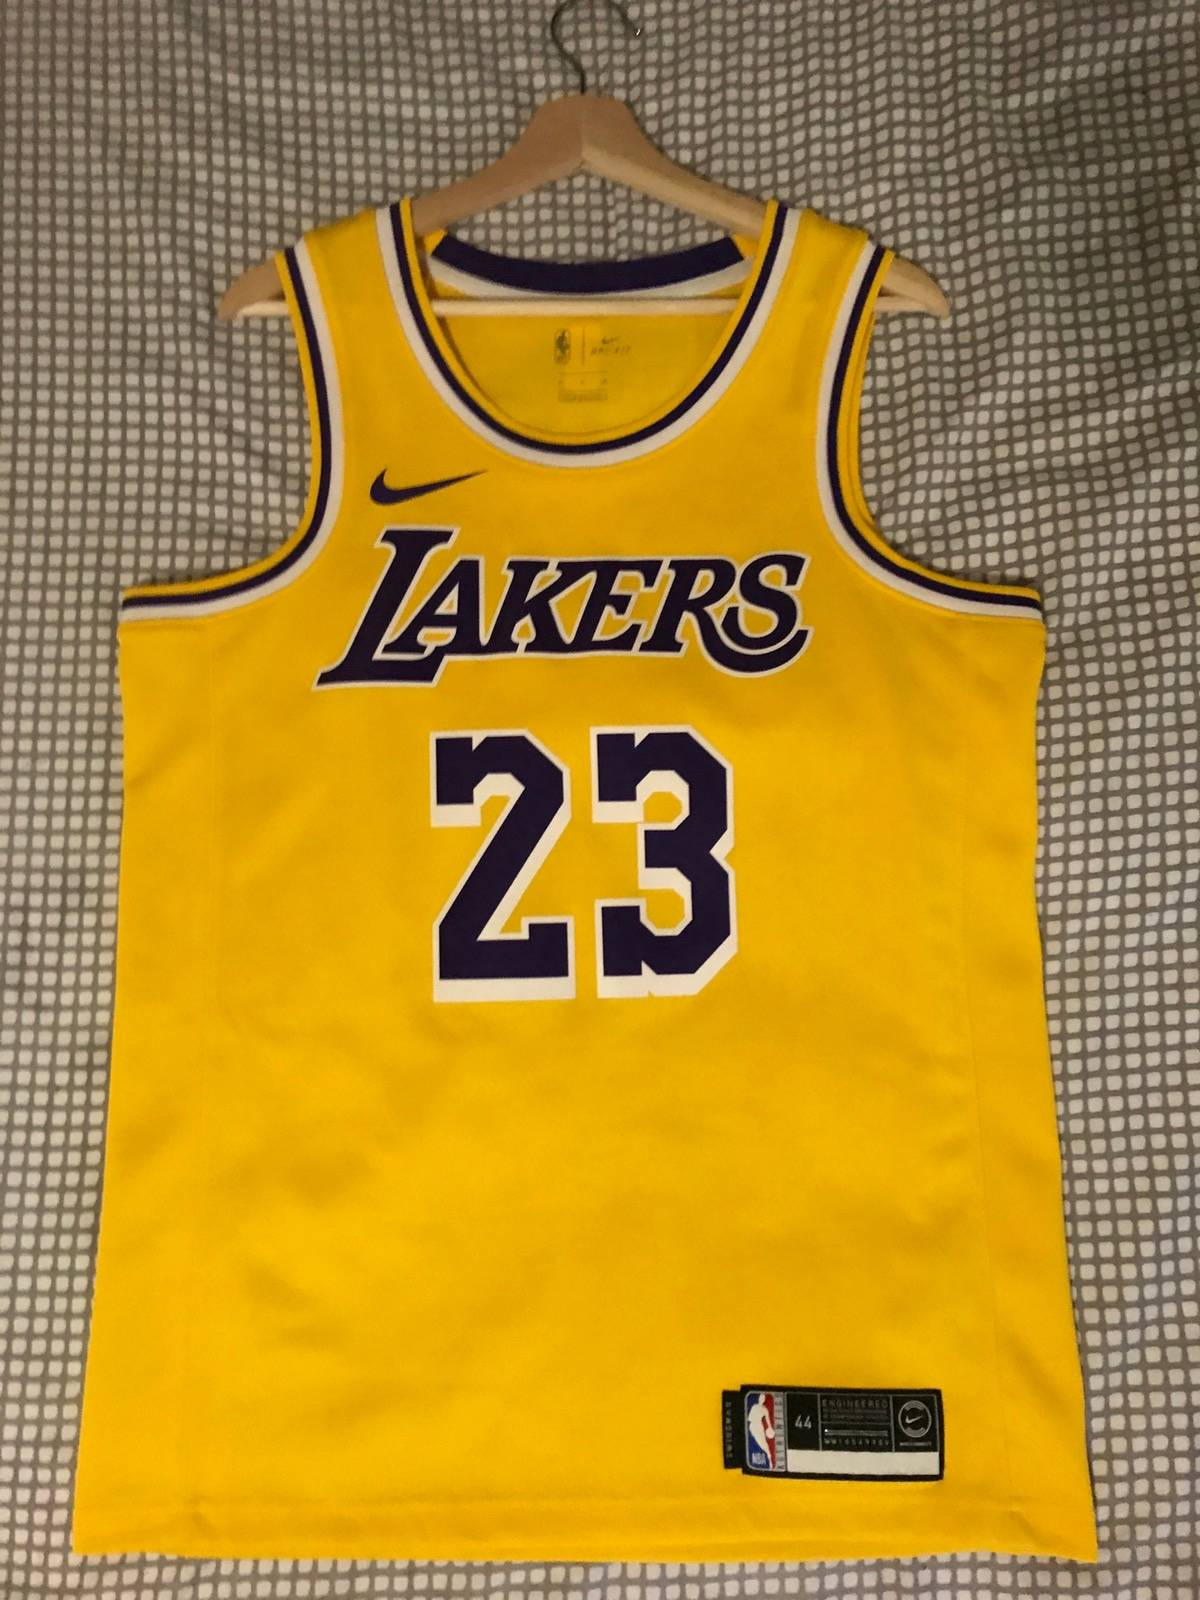 low priced ab314 a9049 Nba × Nike Nike Lebron James Jersey Lakers Size M $85